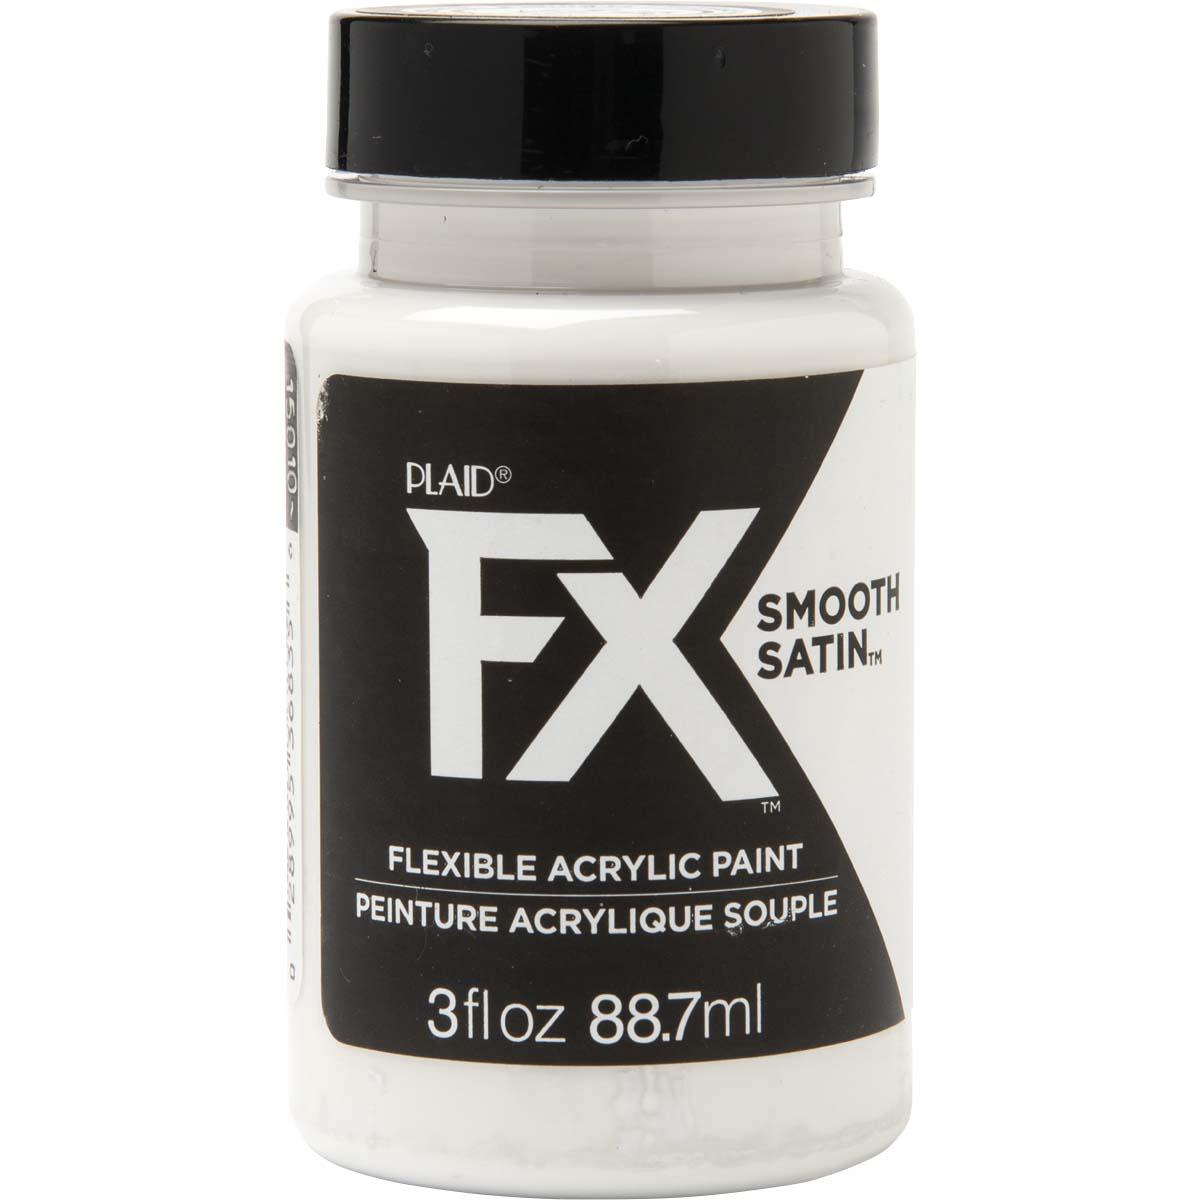 PlaidFX Smooth Satin Flexible Acrylic Paint - Blizzard, 3 oz. - 36835